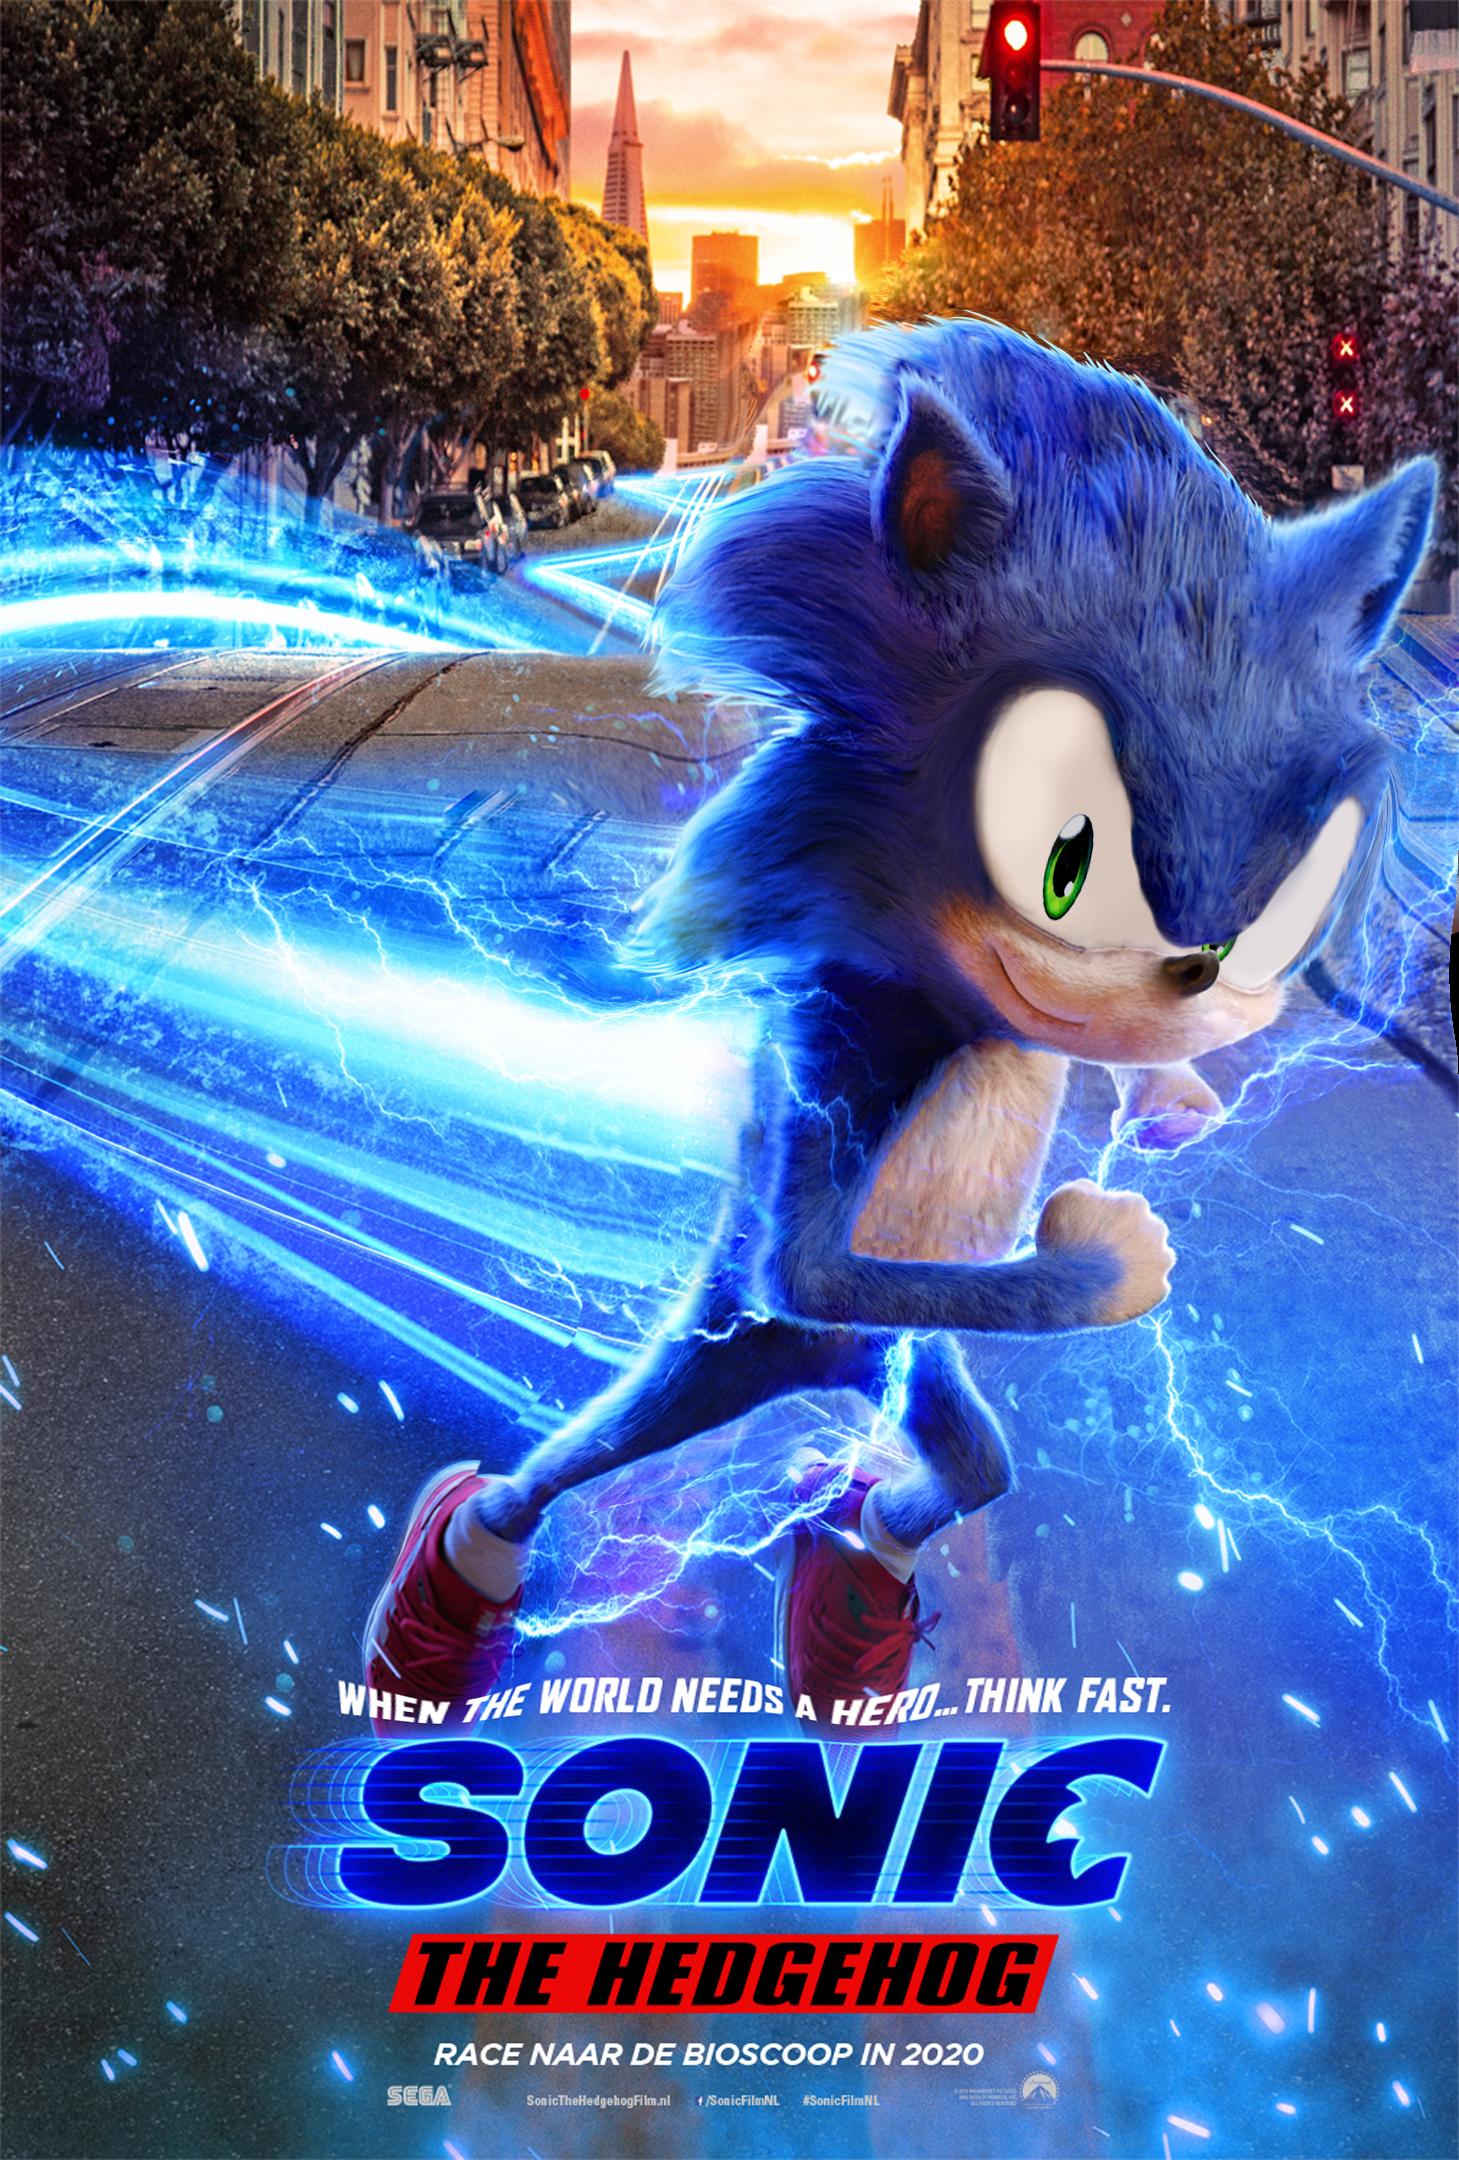 Sonic The Hedgehog Poster My Edit By Daviddv1202 On Deviantart